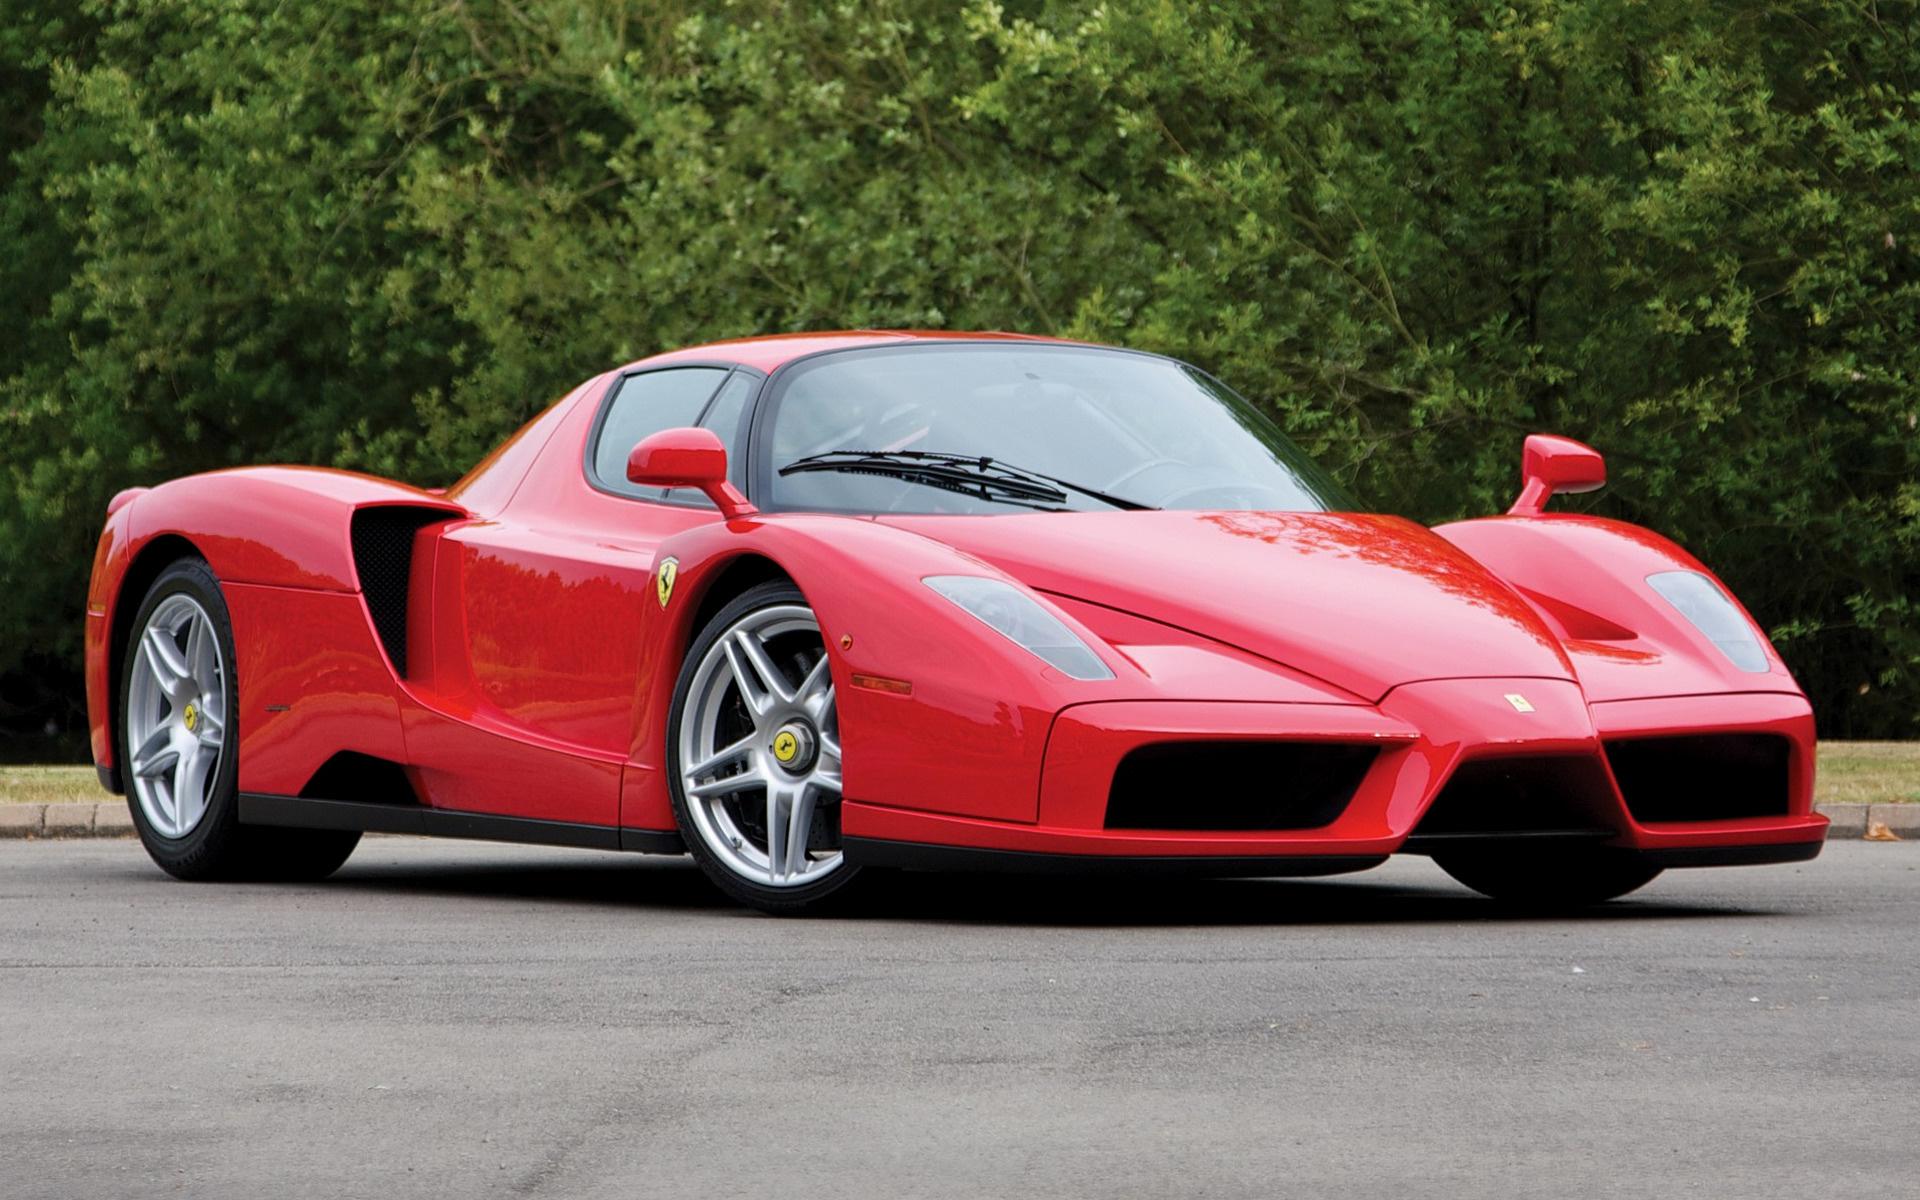 Enzo Ferrari (2002) Wallpapers and HD Images - Car Pixel